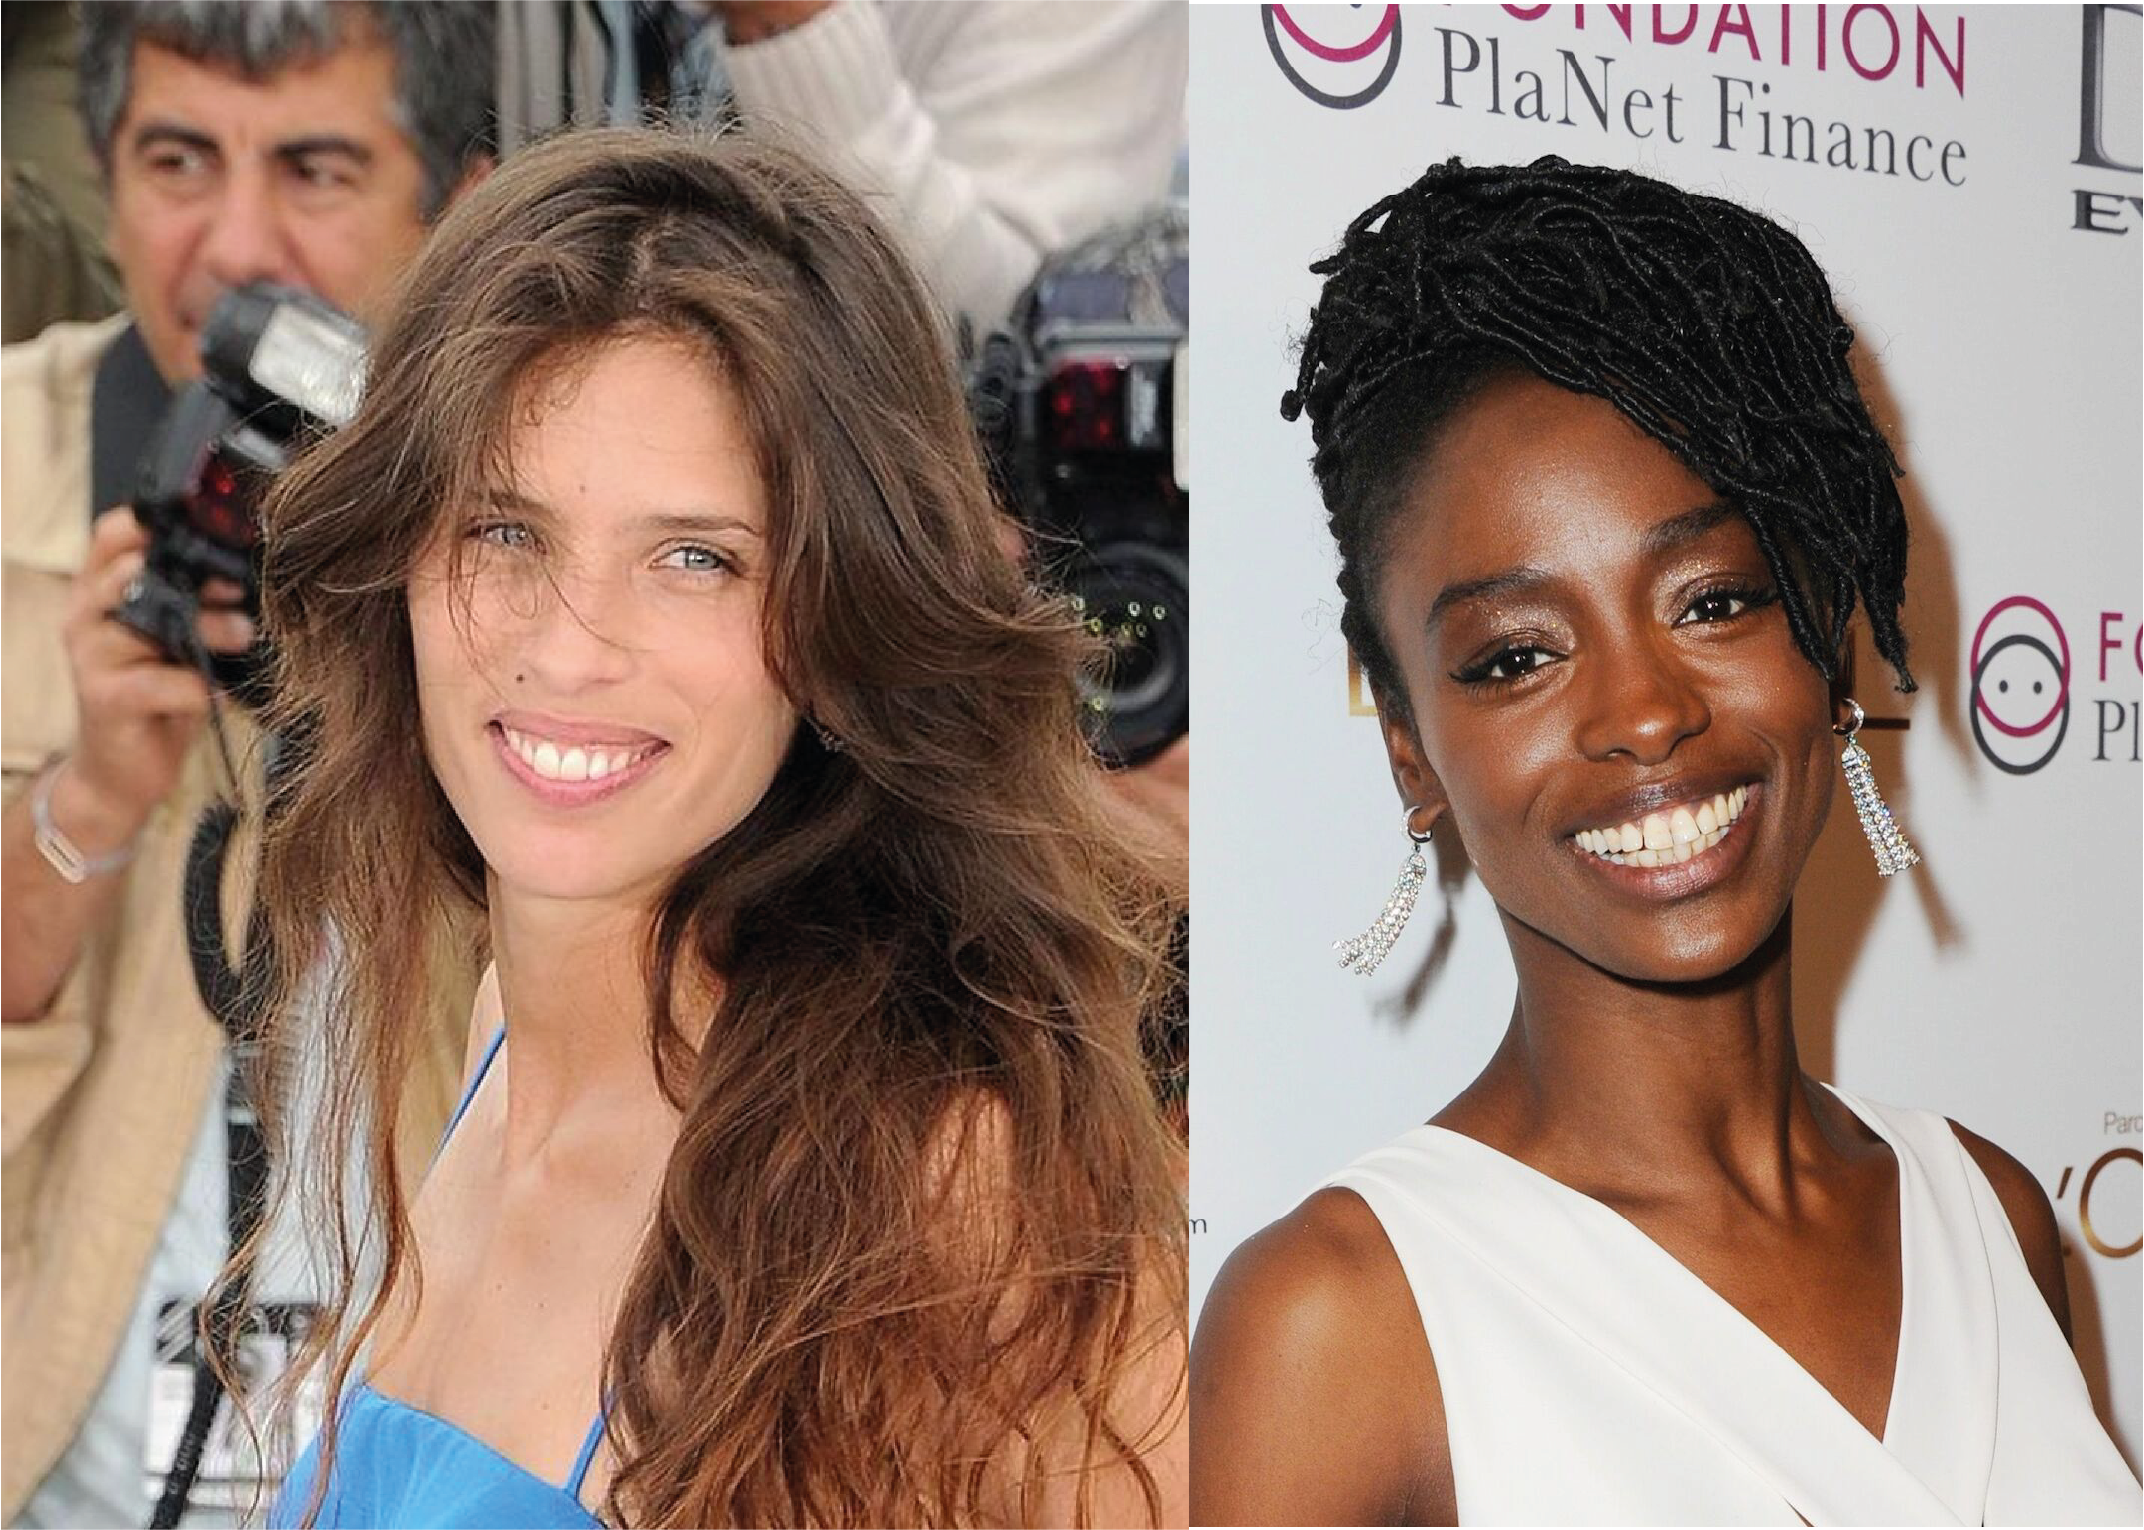 casting figurants film neneh superstar réalisé par Ramzi Ben Sliman avec Maïween et Aïssa Maïga